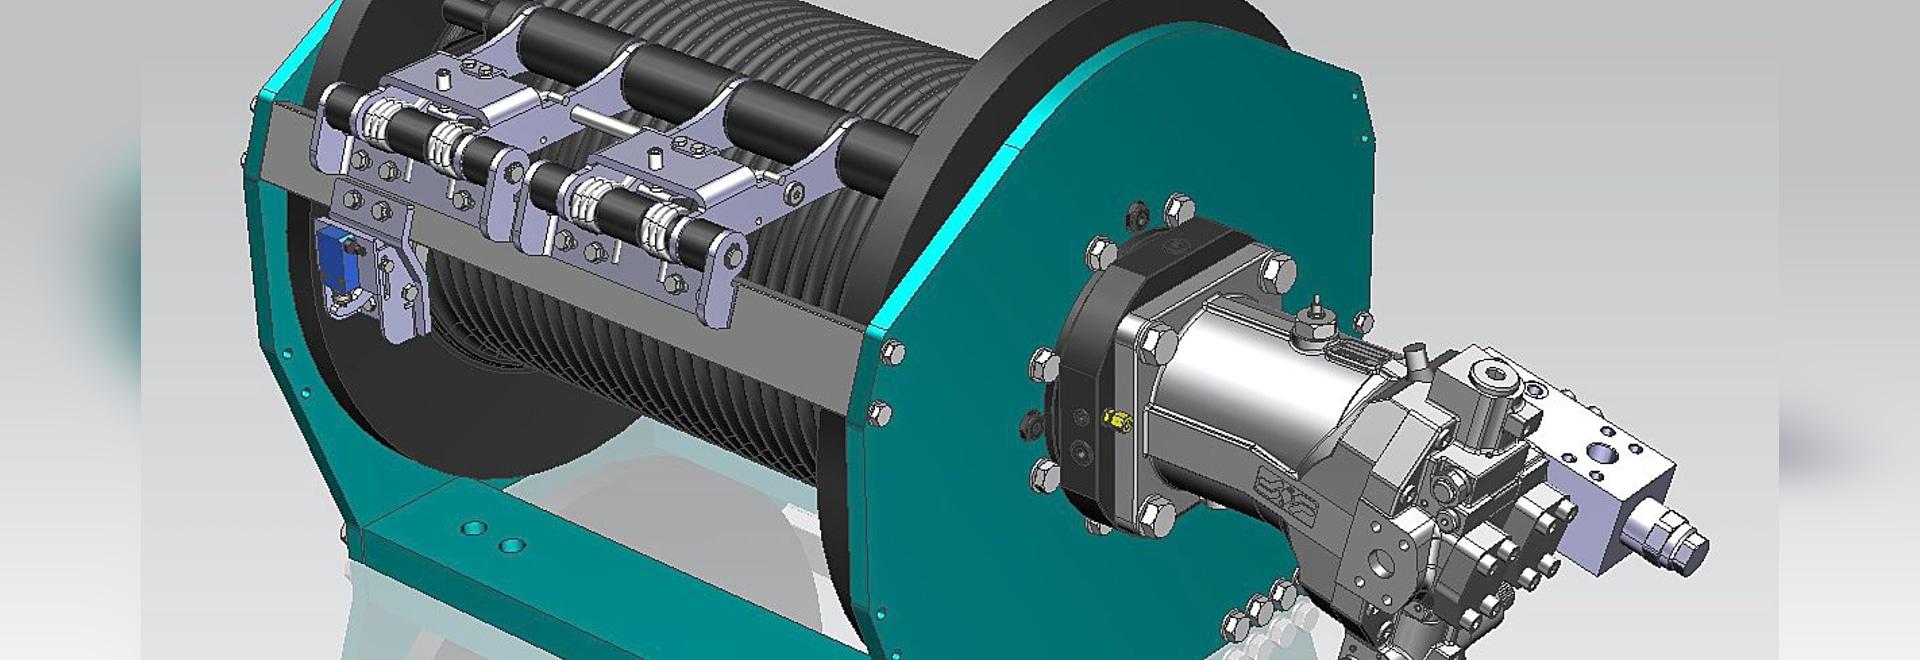 Brevini: New series of axial piston units